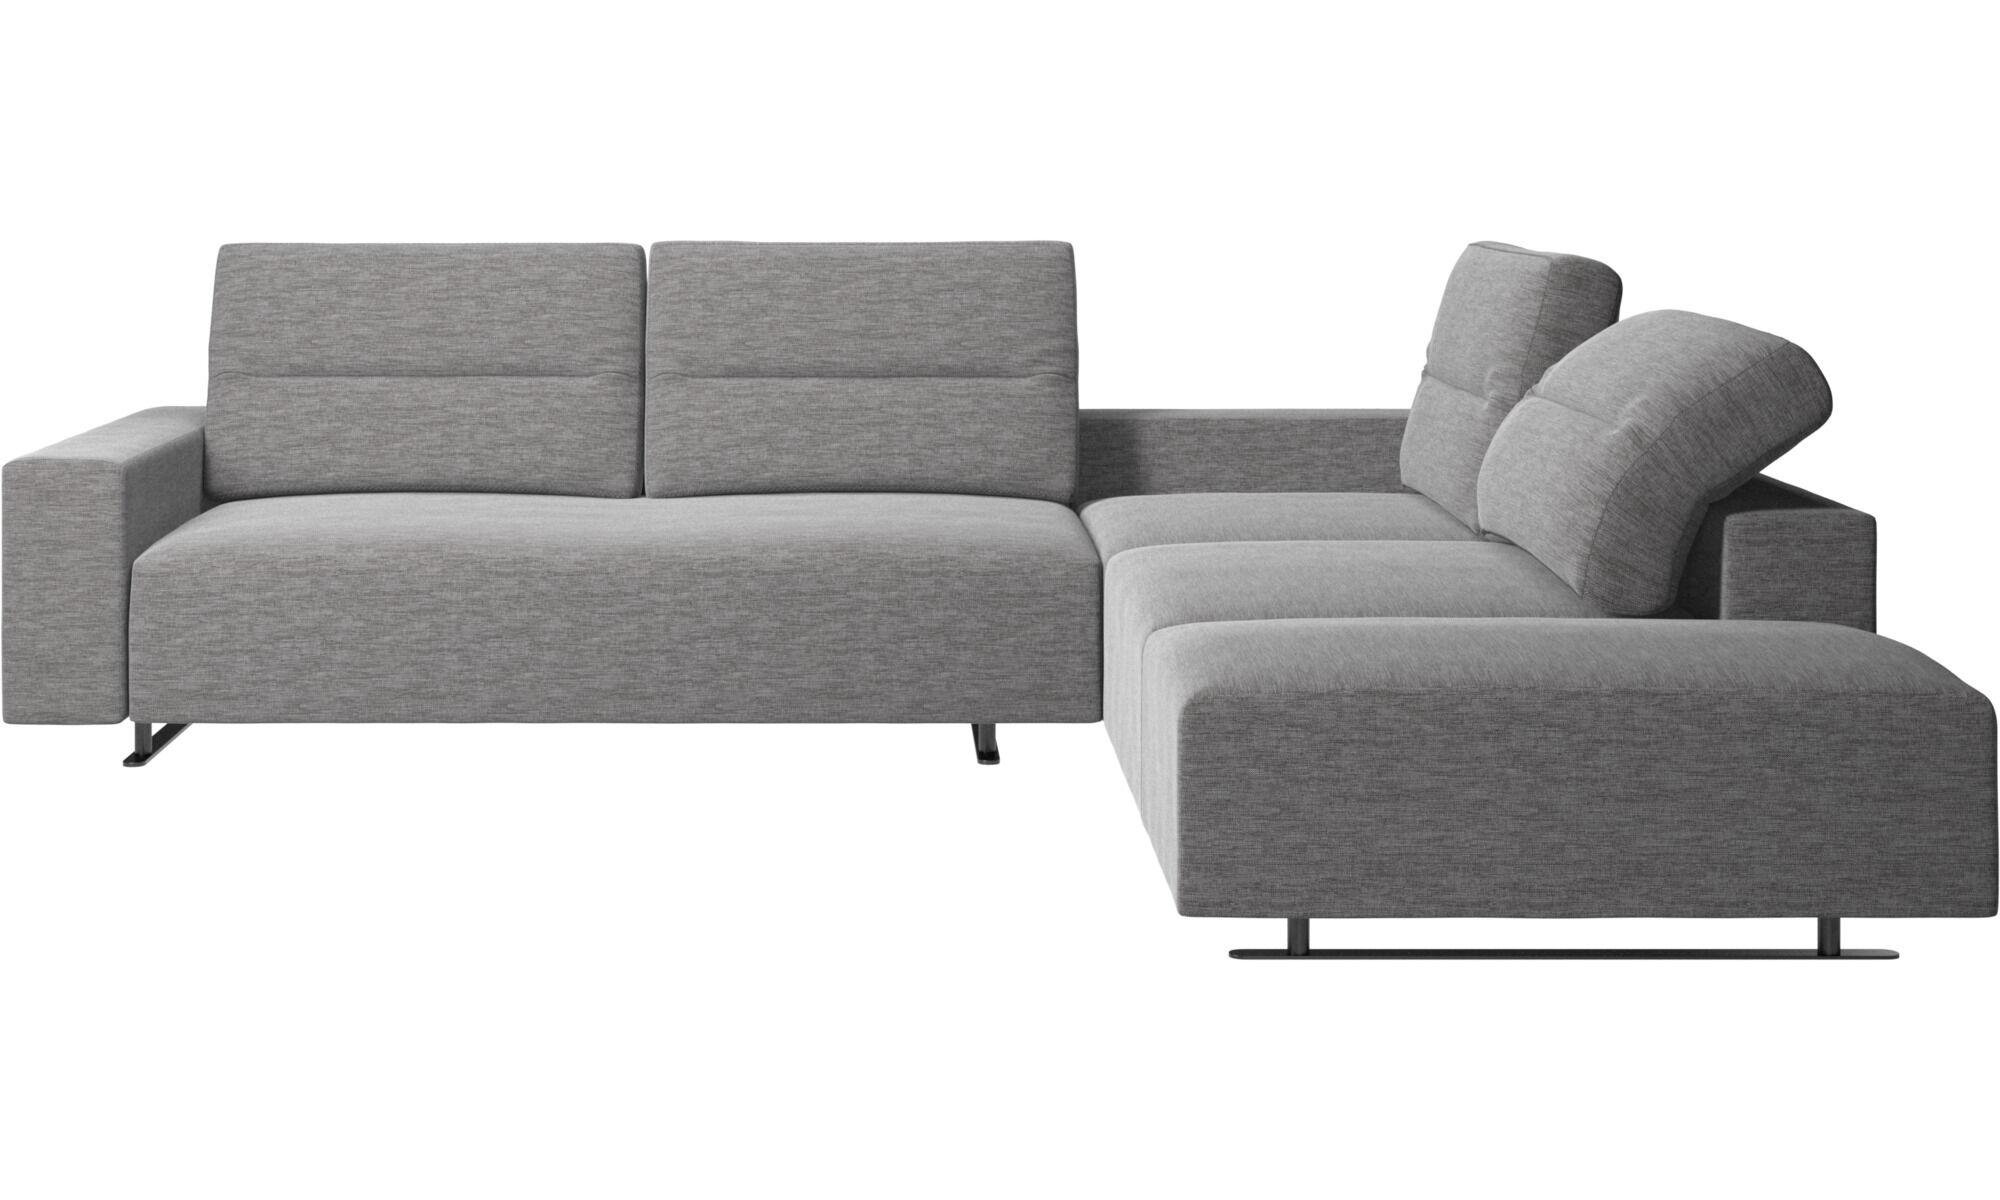 Corner Sofas   Hampton Corner Sofa With Adjustable Back And Storage On Left  Side   Gray